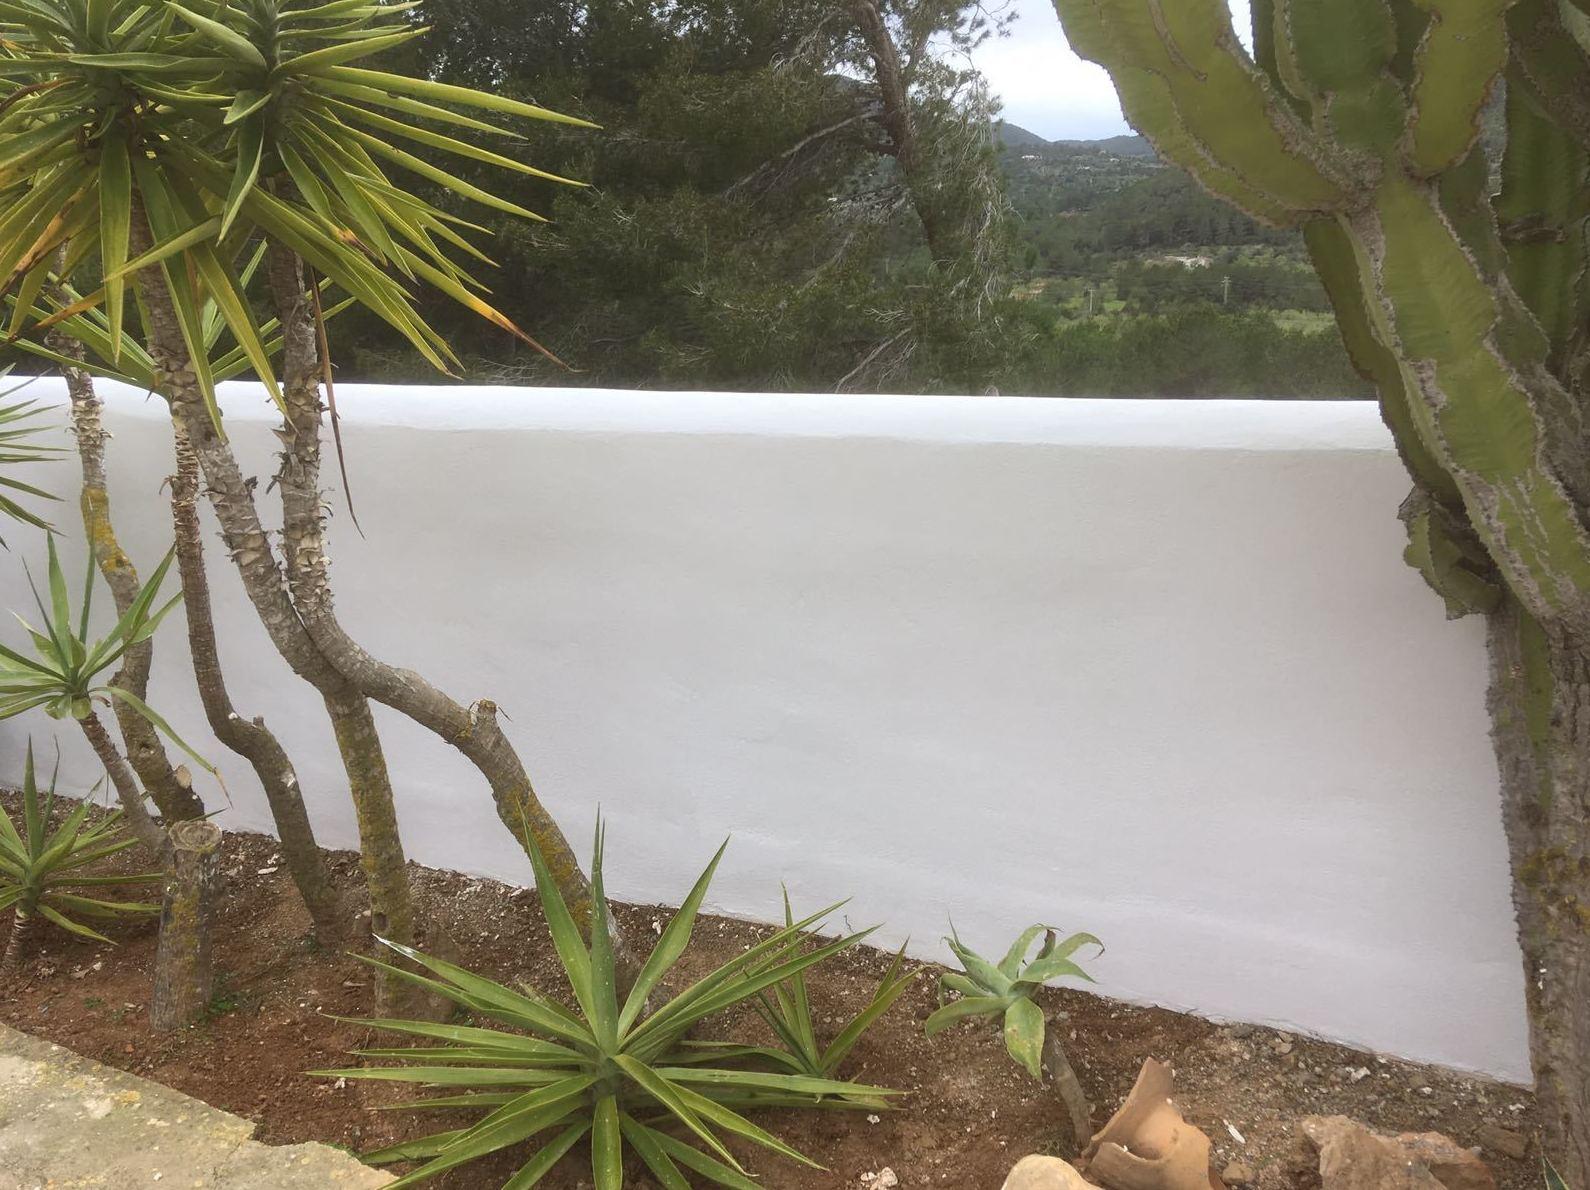 Reforma de valla exterior, Ibiza. Muro terminado